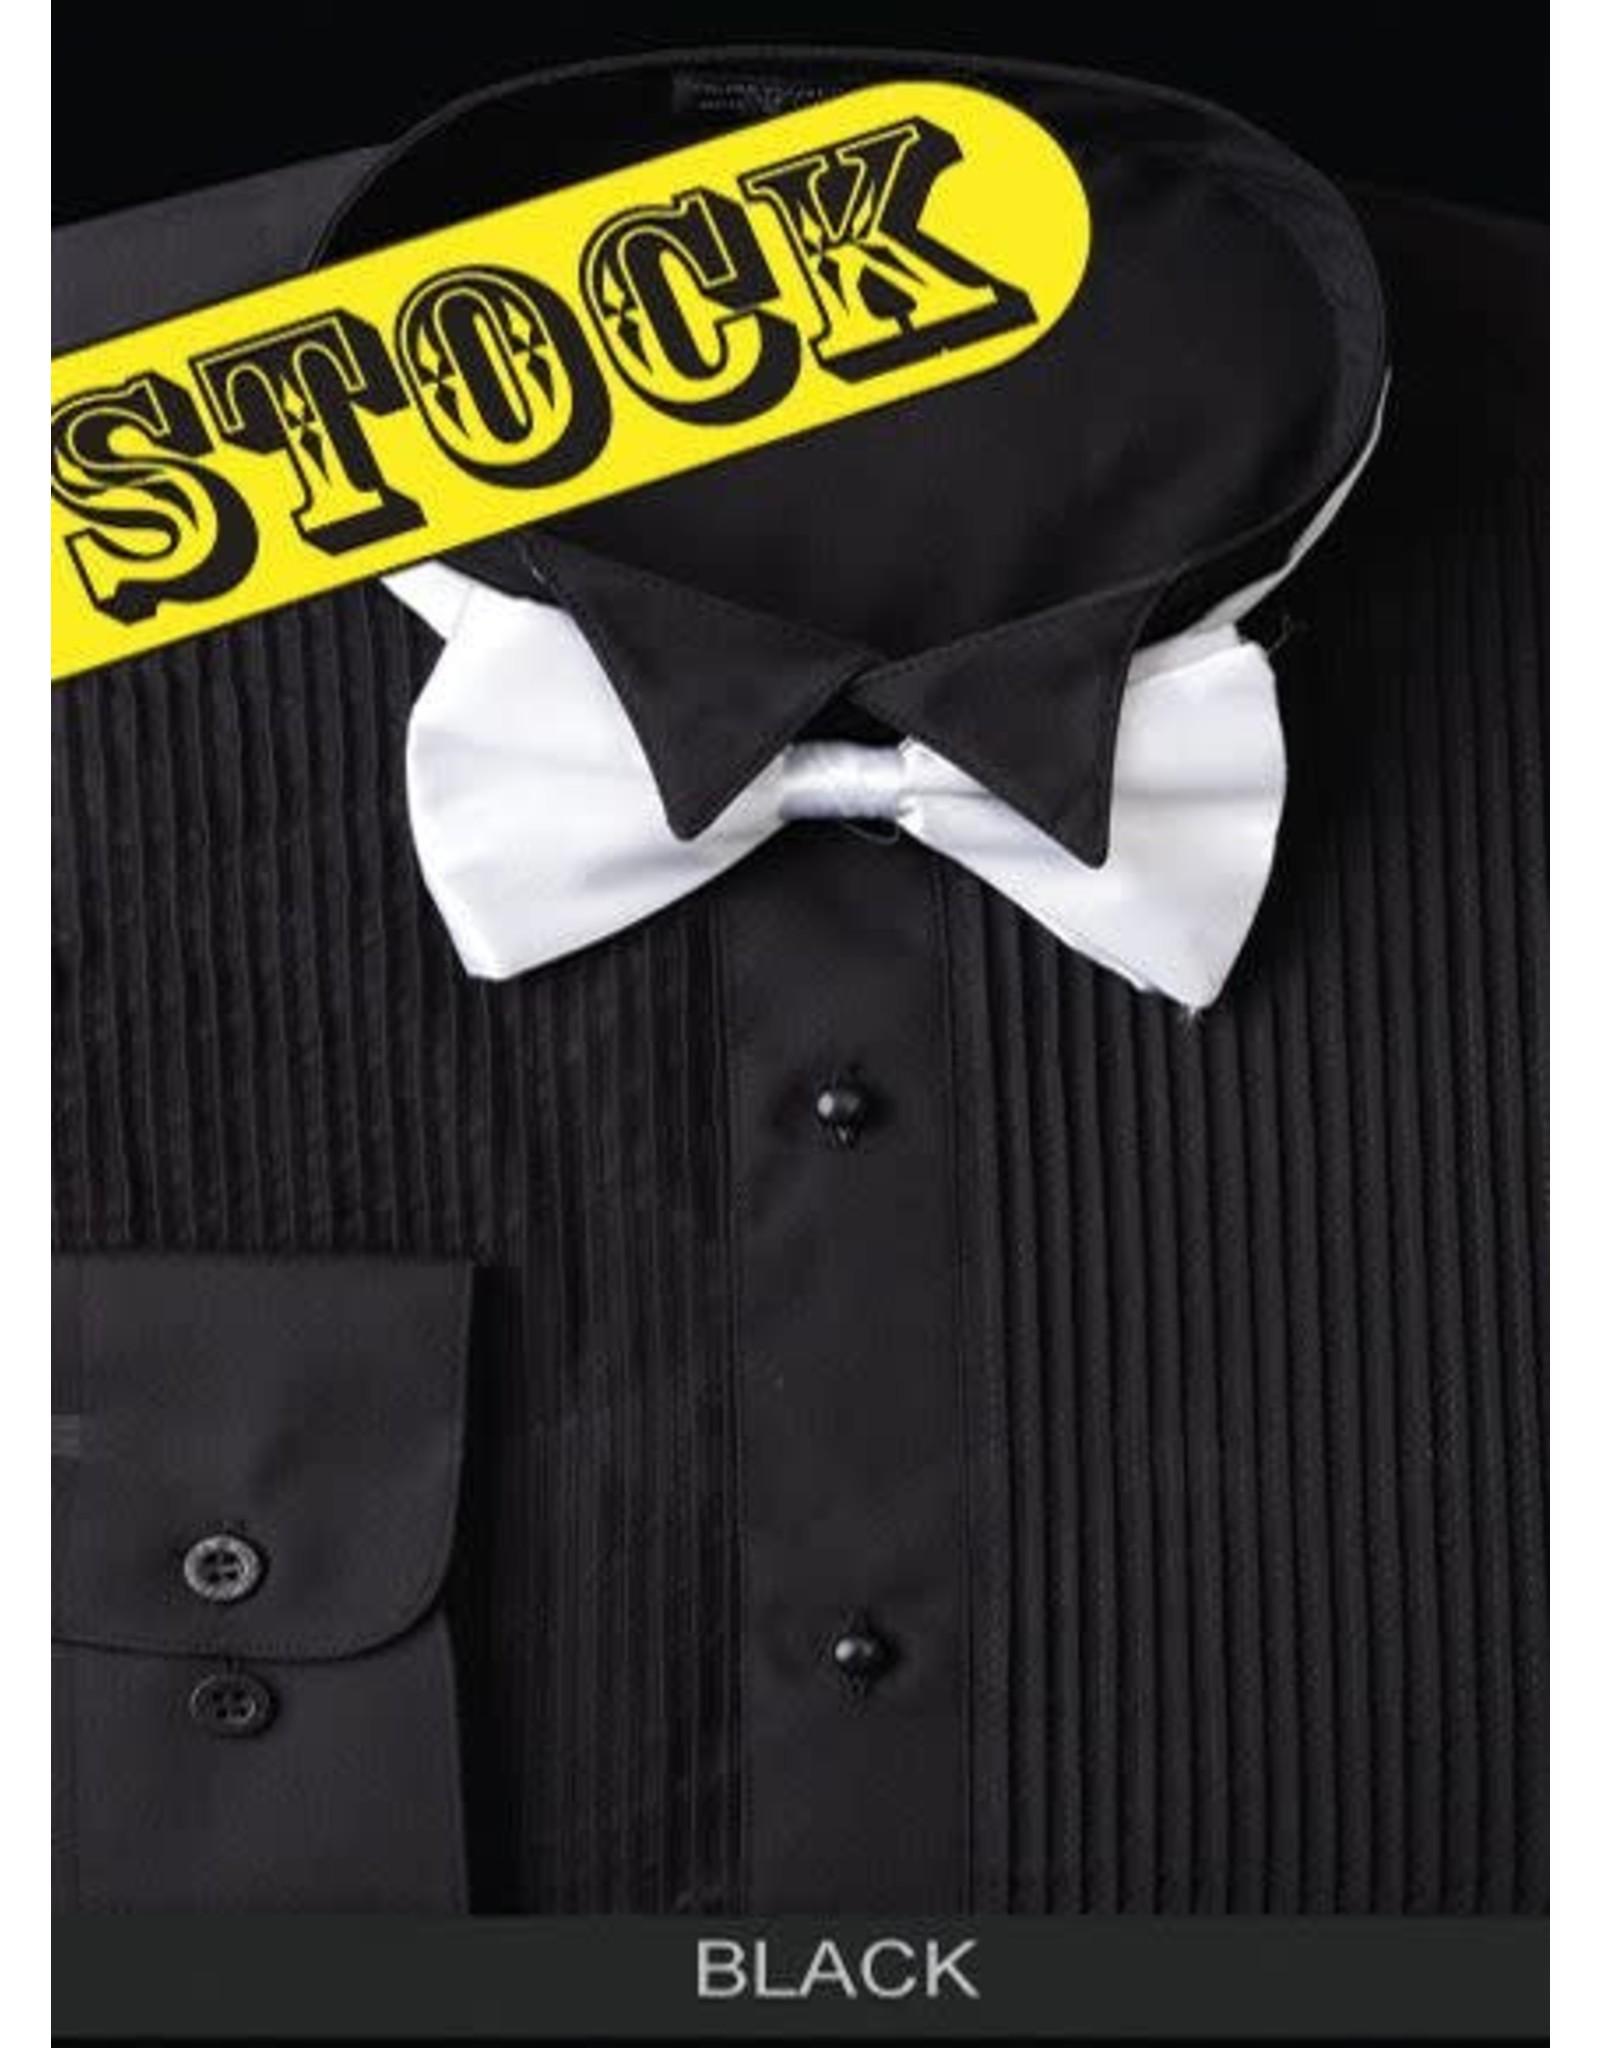 Daniel Ellissa Wing Collar Tuxedo Shirt & Bowtie - Black